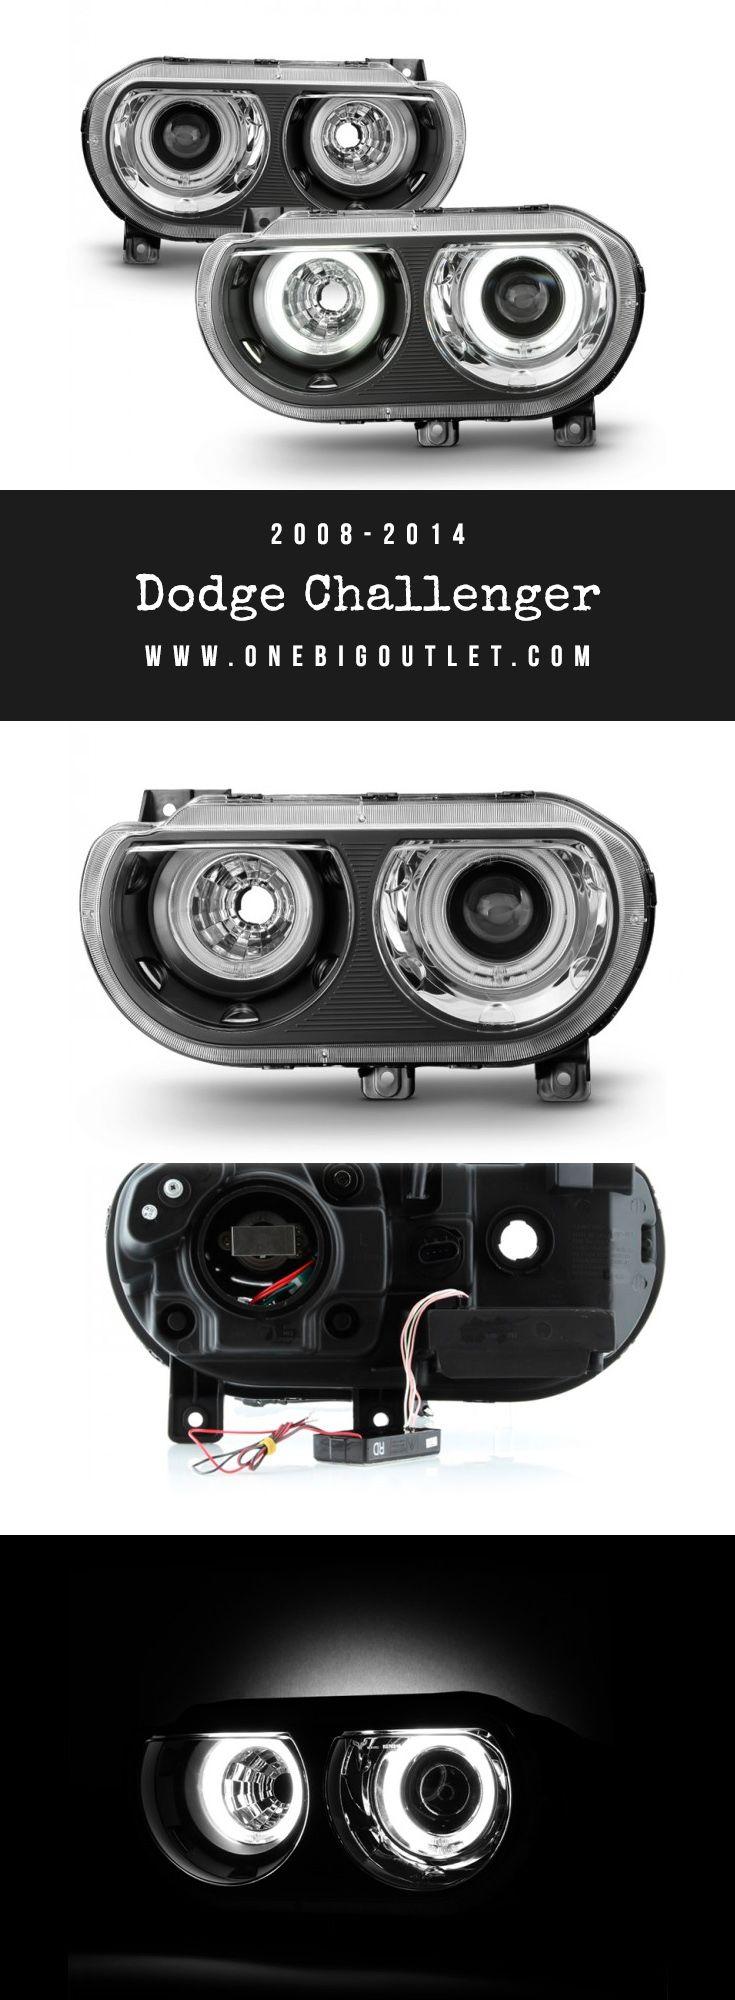 2008 2014 dodge challenger halo projector headlights in black dodge challenger headlights